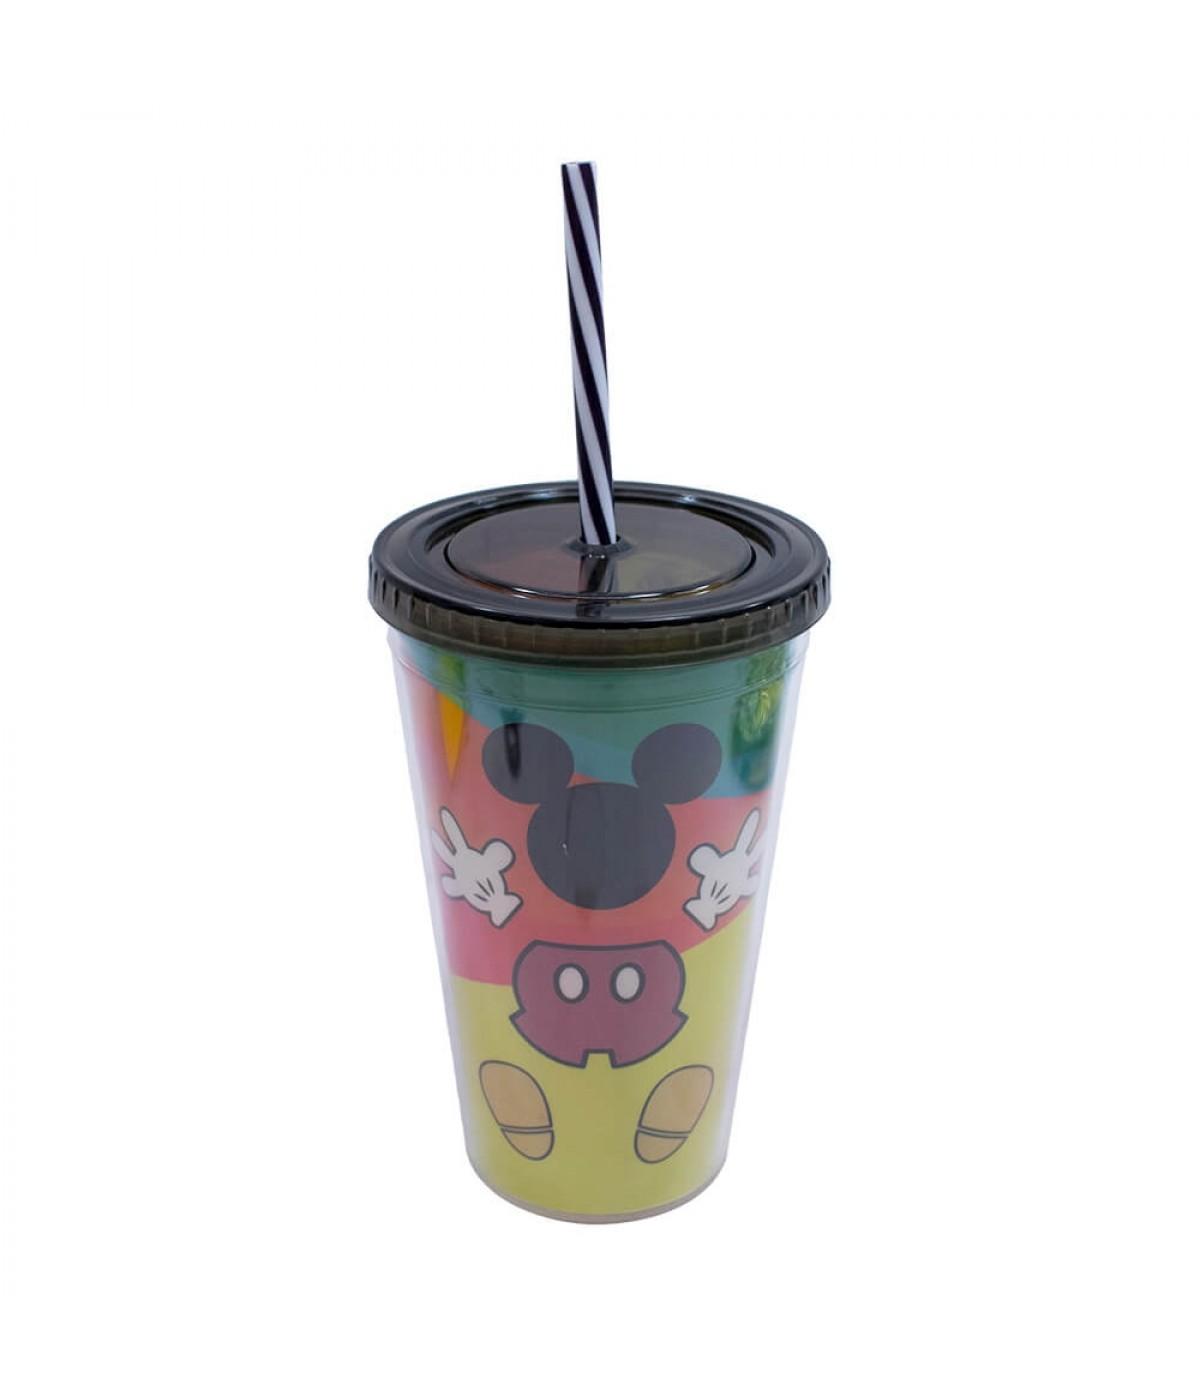 Copo Com Canudo Formato Mickey Colorido 450ml 90 Anos - Disney